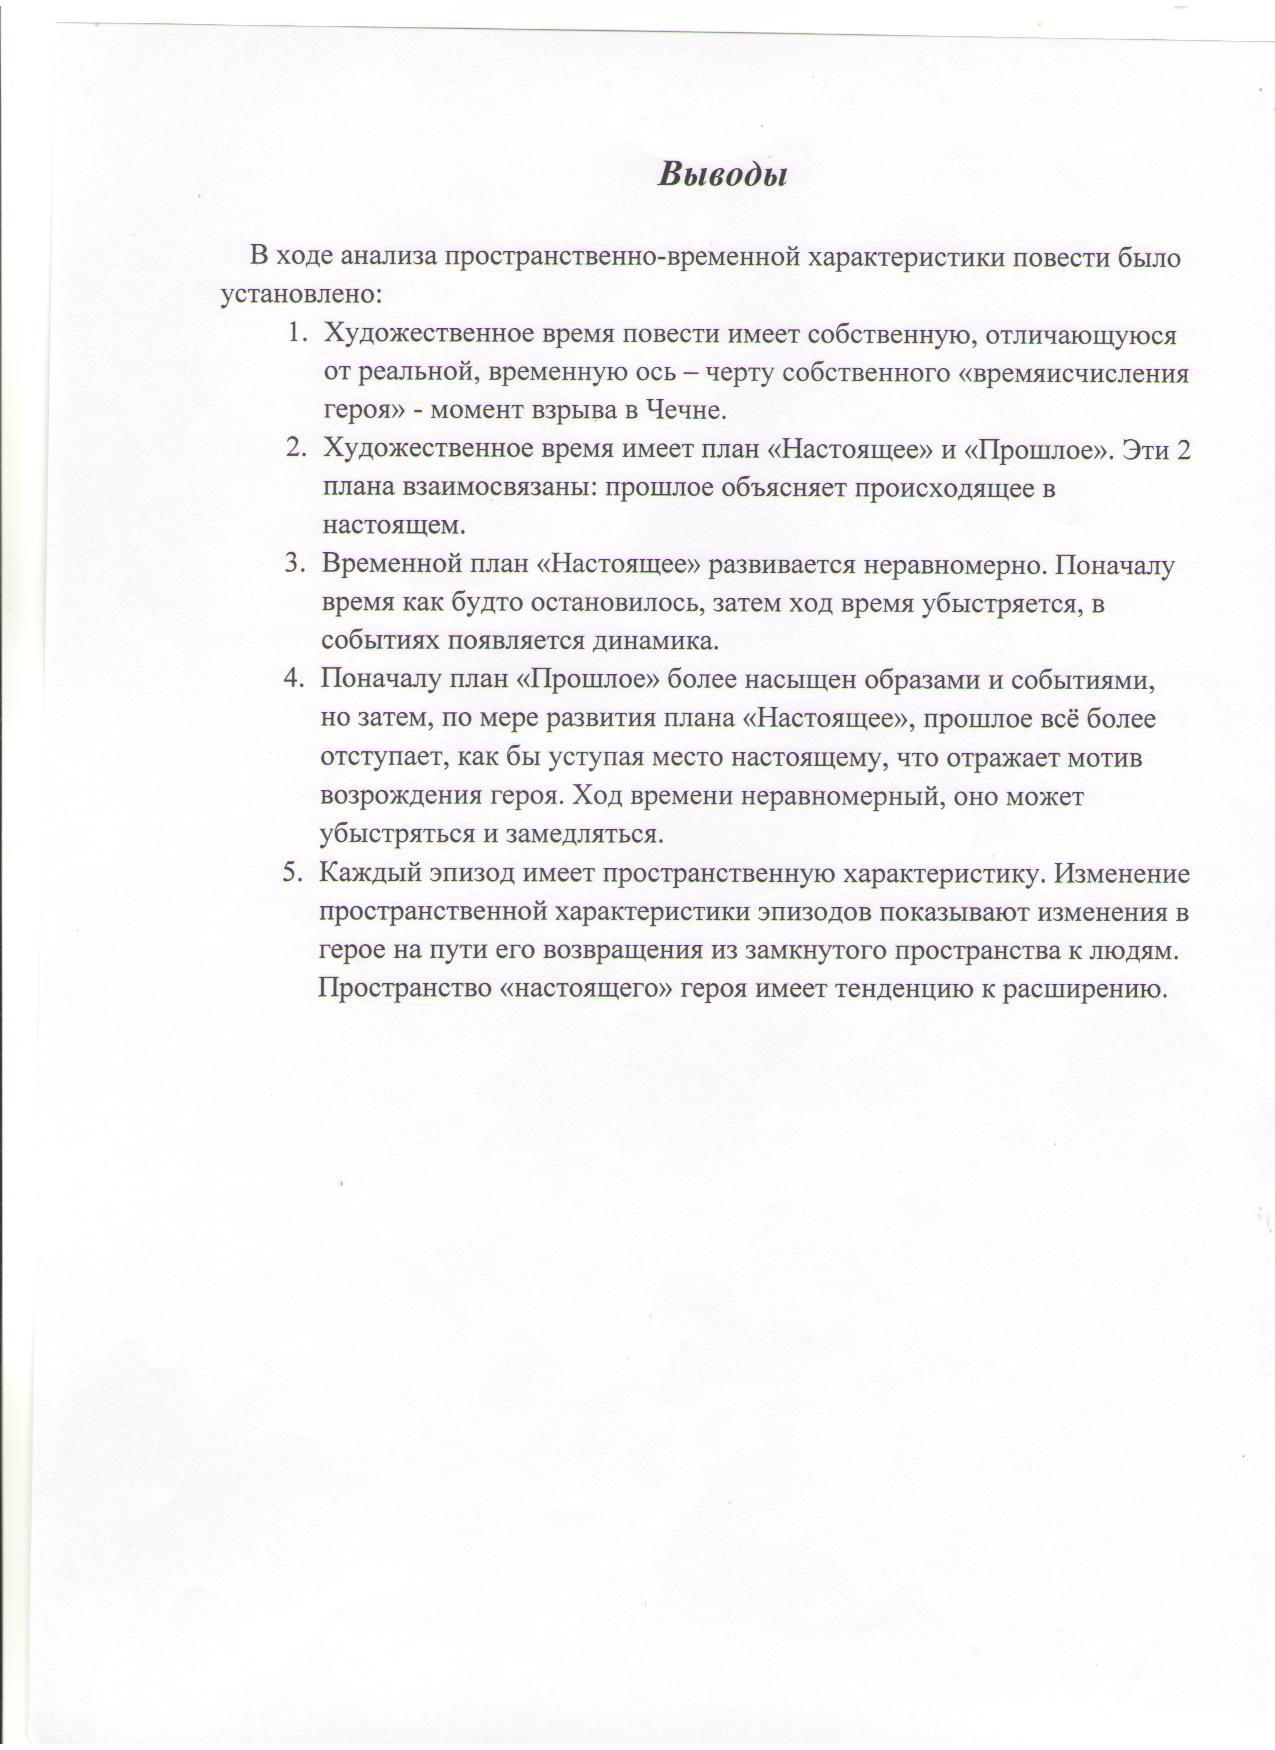 C:\Documents and Settings\Иван\Рабочий стол\gtlcjdtn\изображение 011.jpg